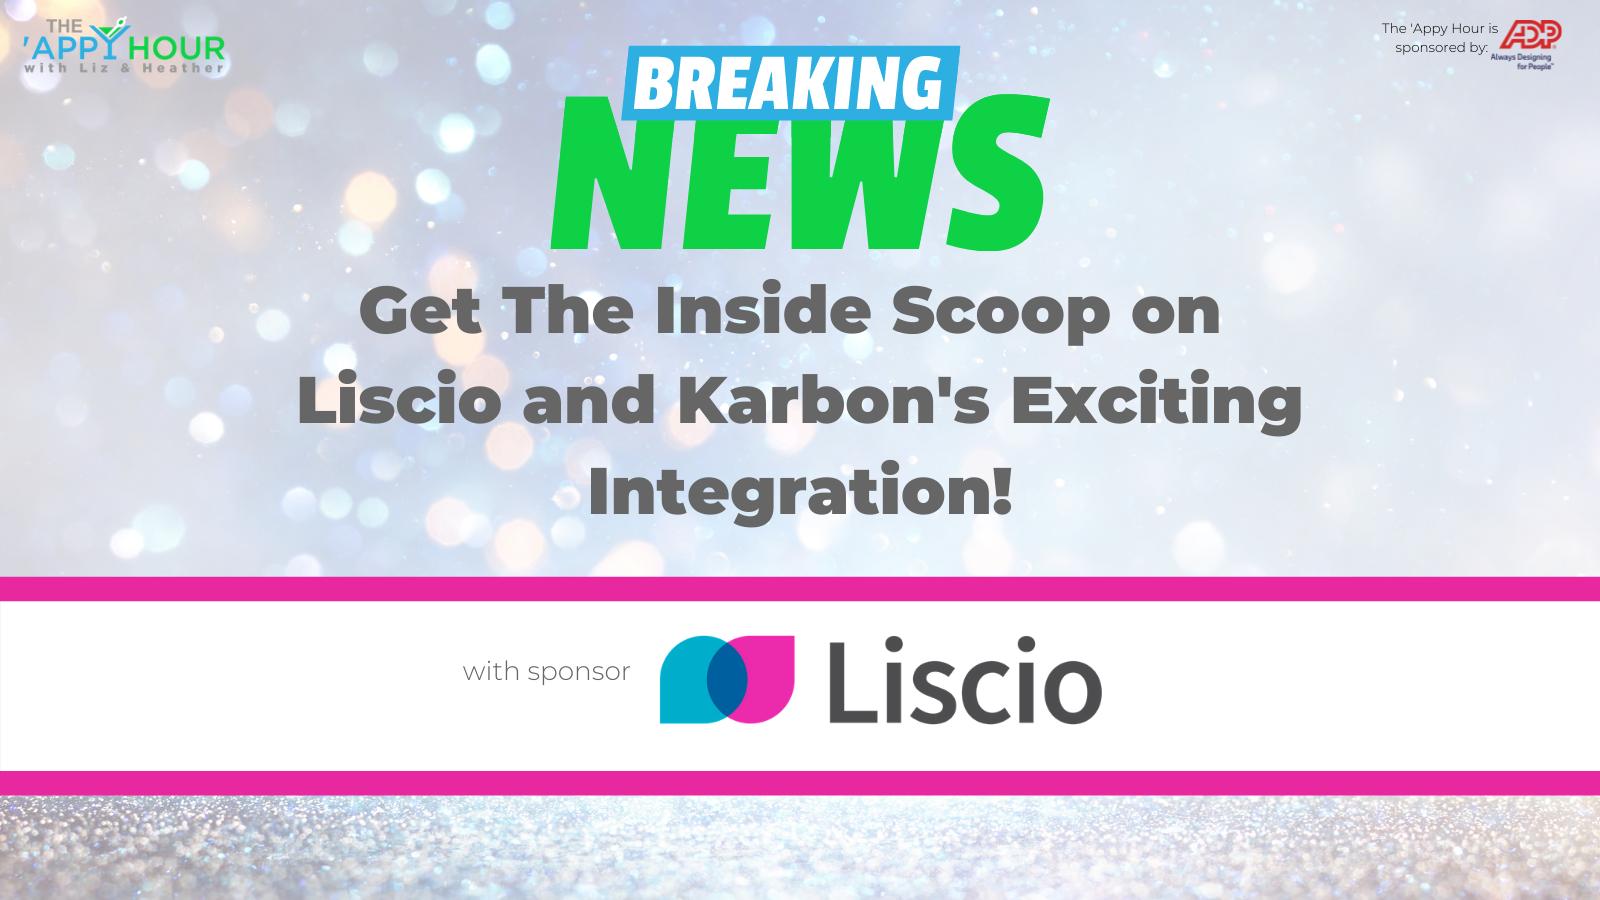 Optimize Your Workflow With Liscio + Karbon